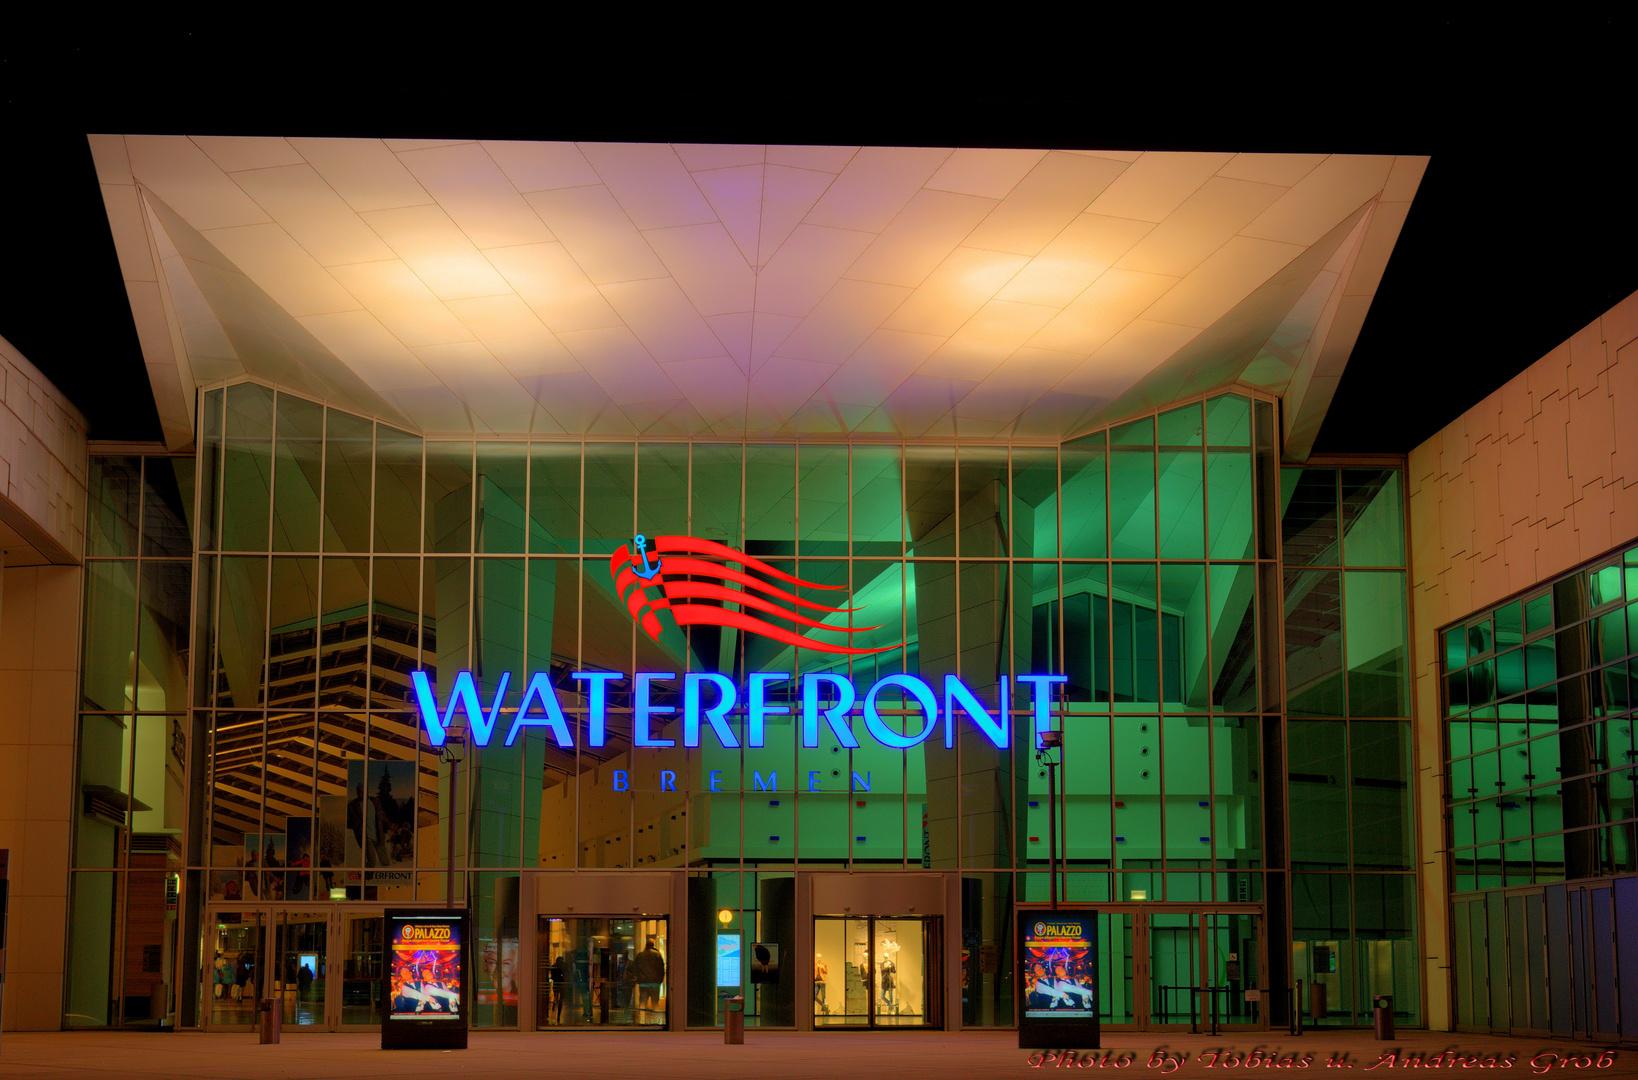 -Bremen Nightview Waterfront-